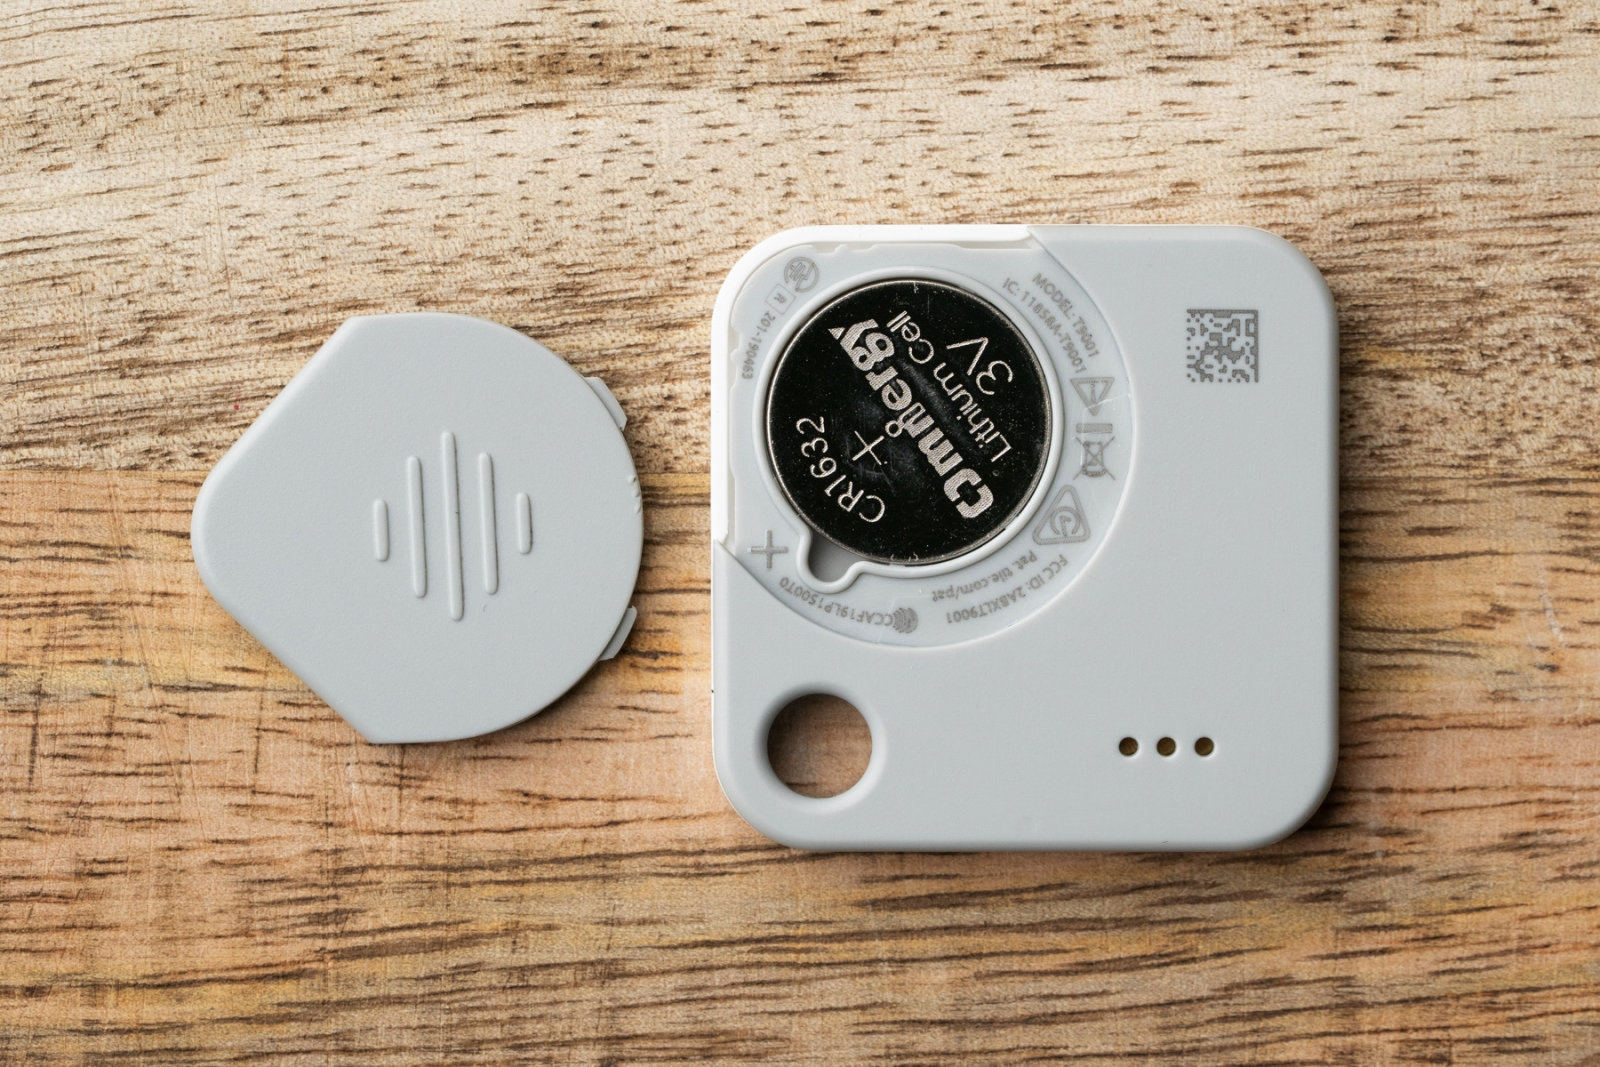 The best Bluetooth tracker | DeviceDaily.com